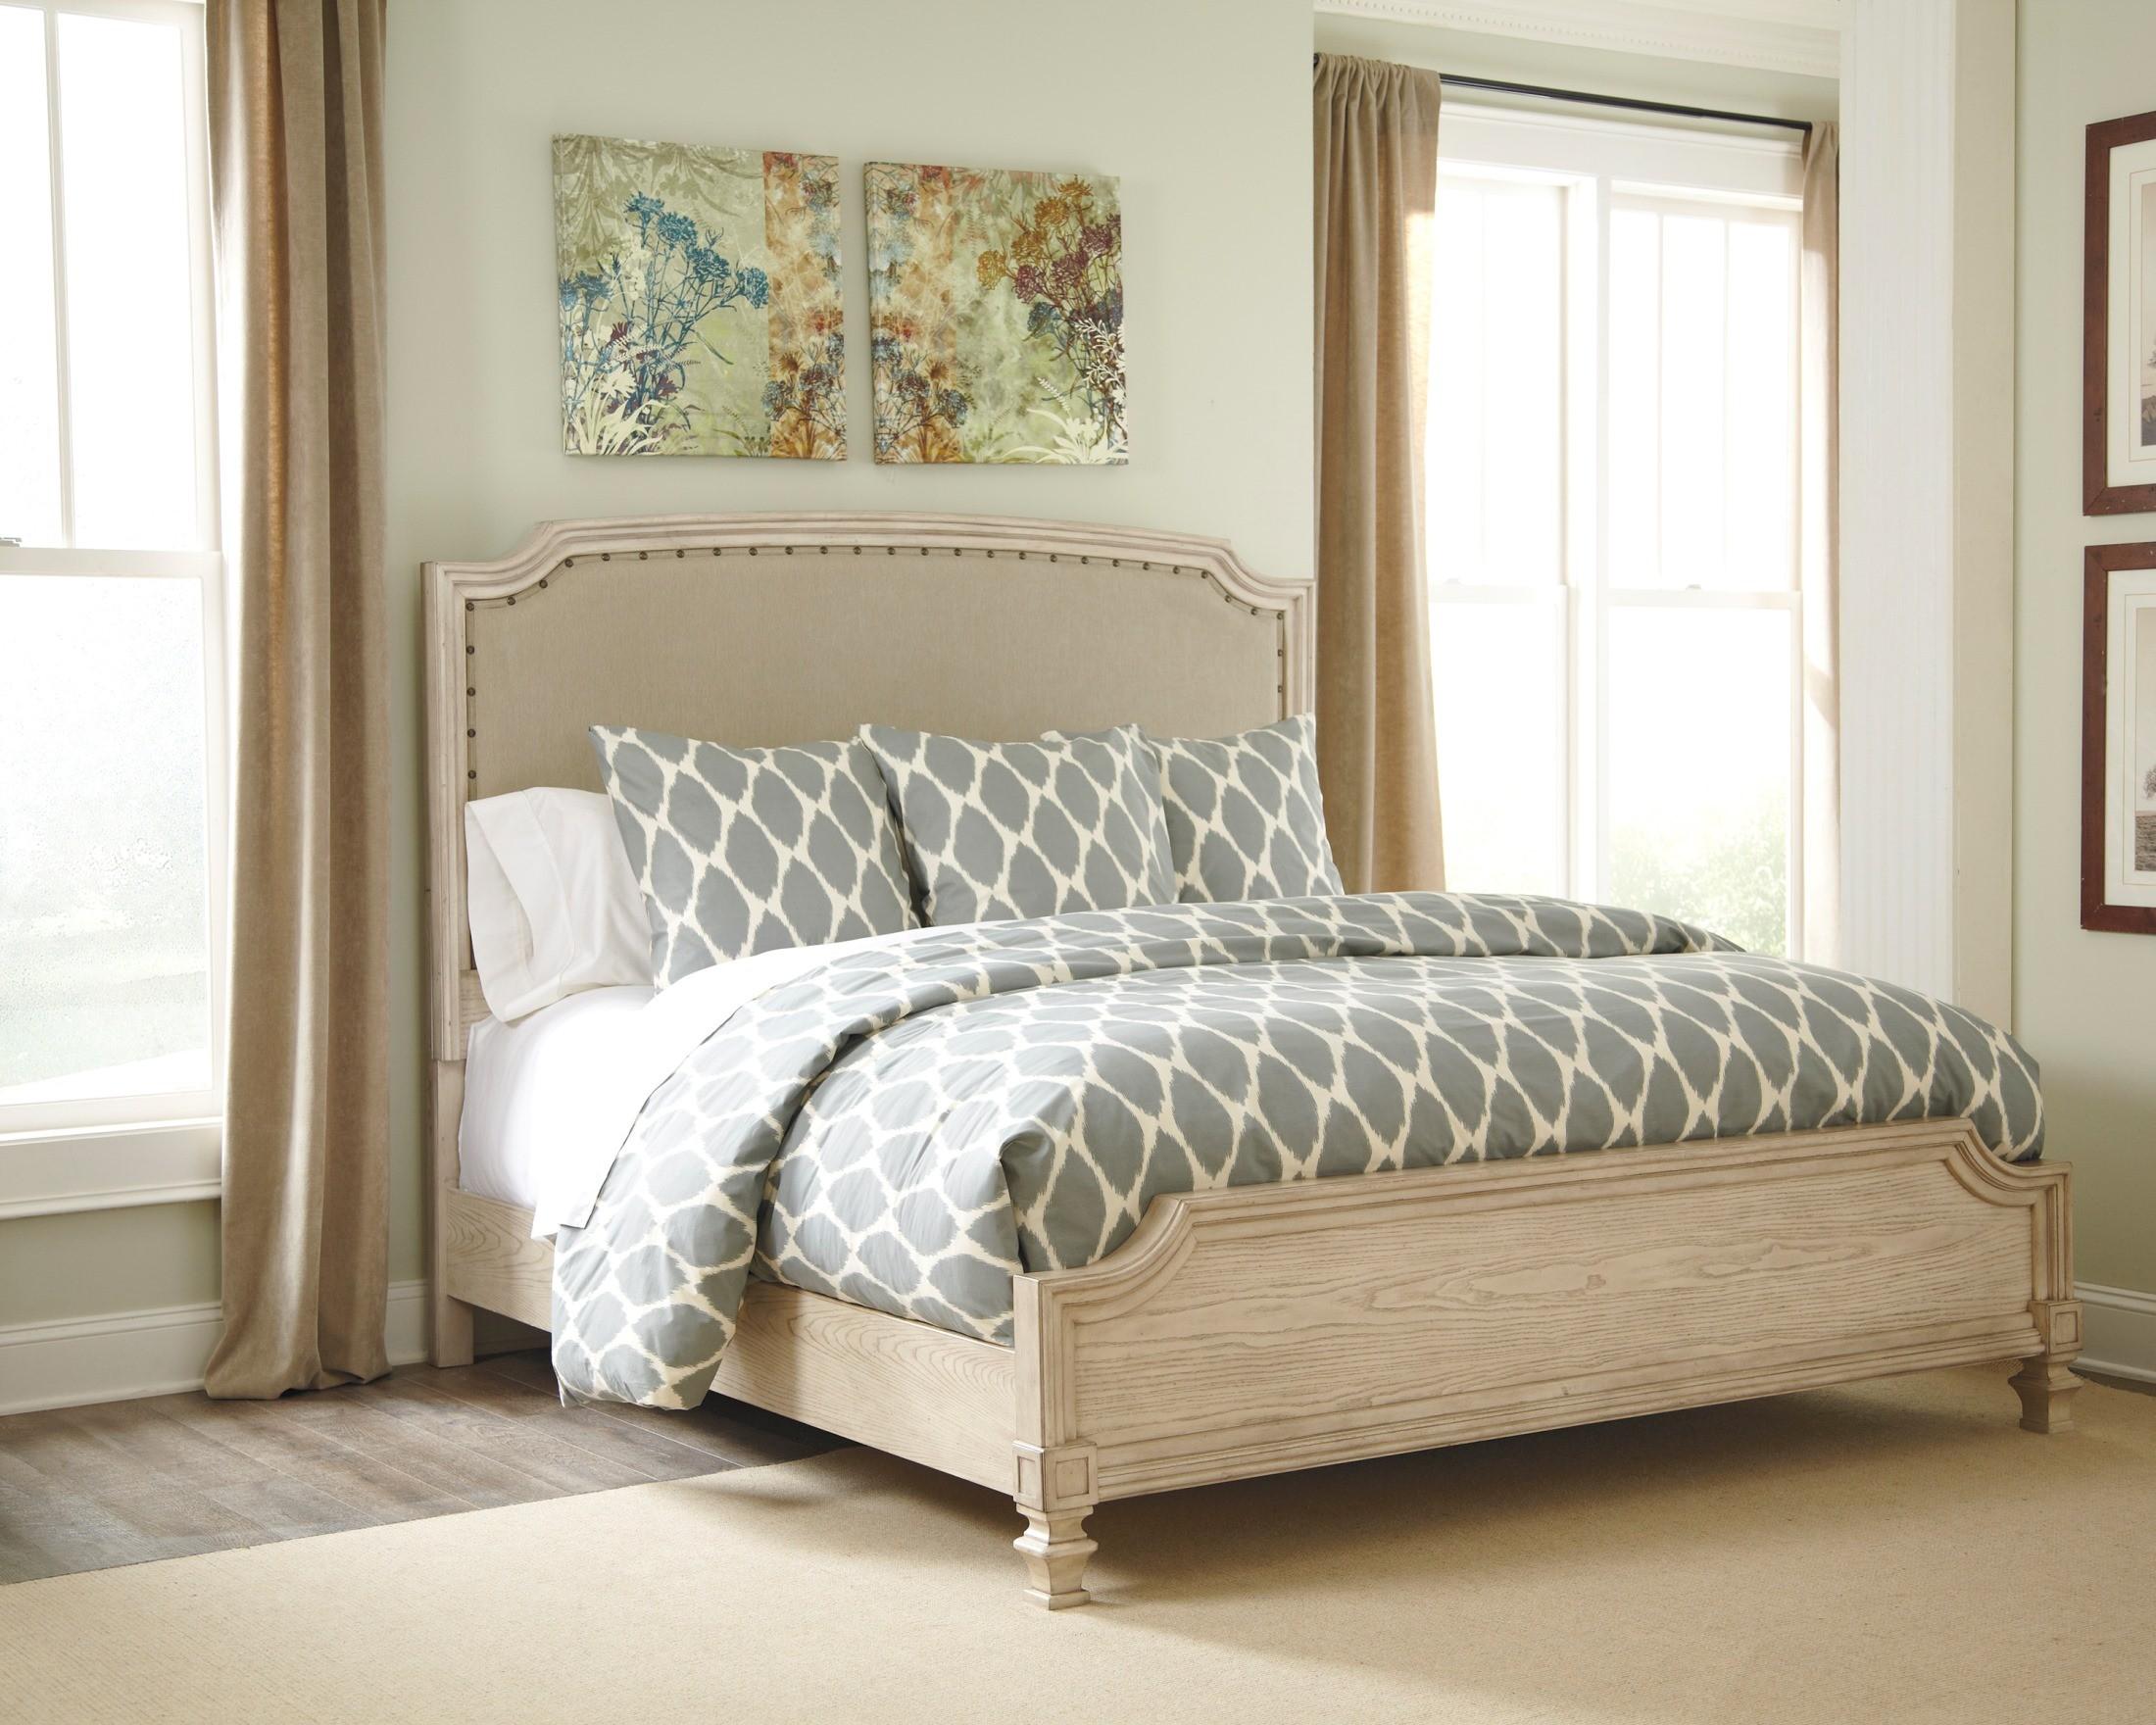 Demarlos Cal King Upholstered Panel Bed B693 76 78 94